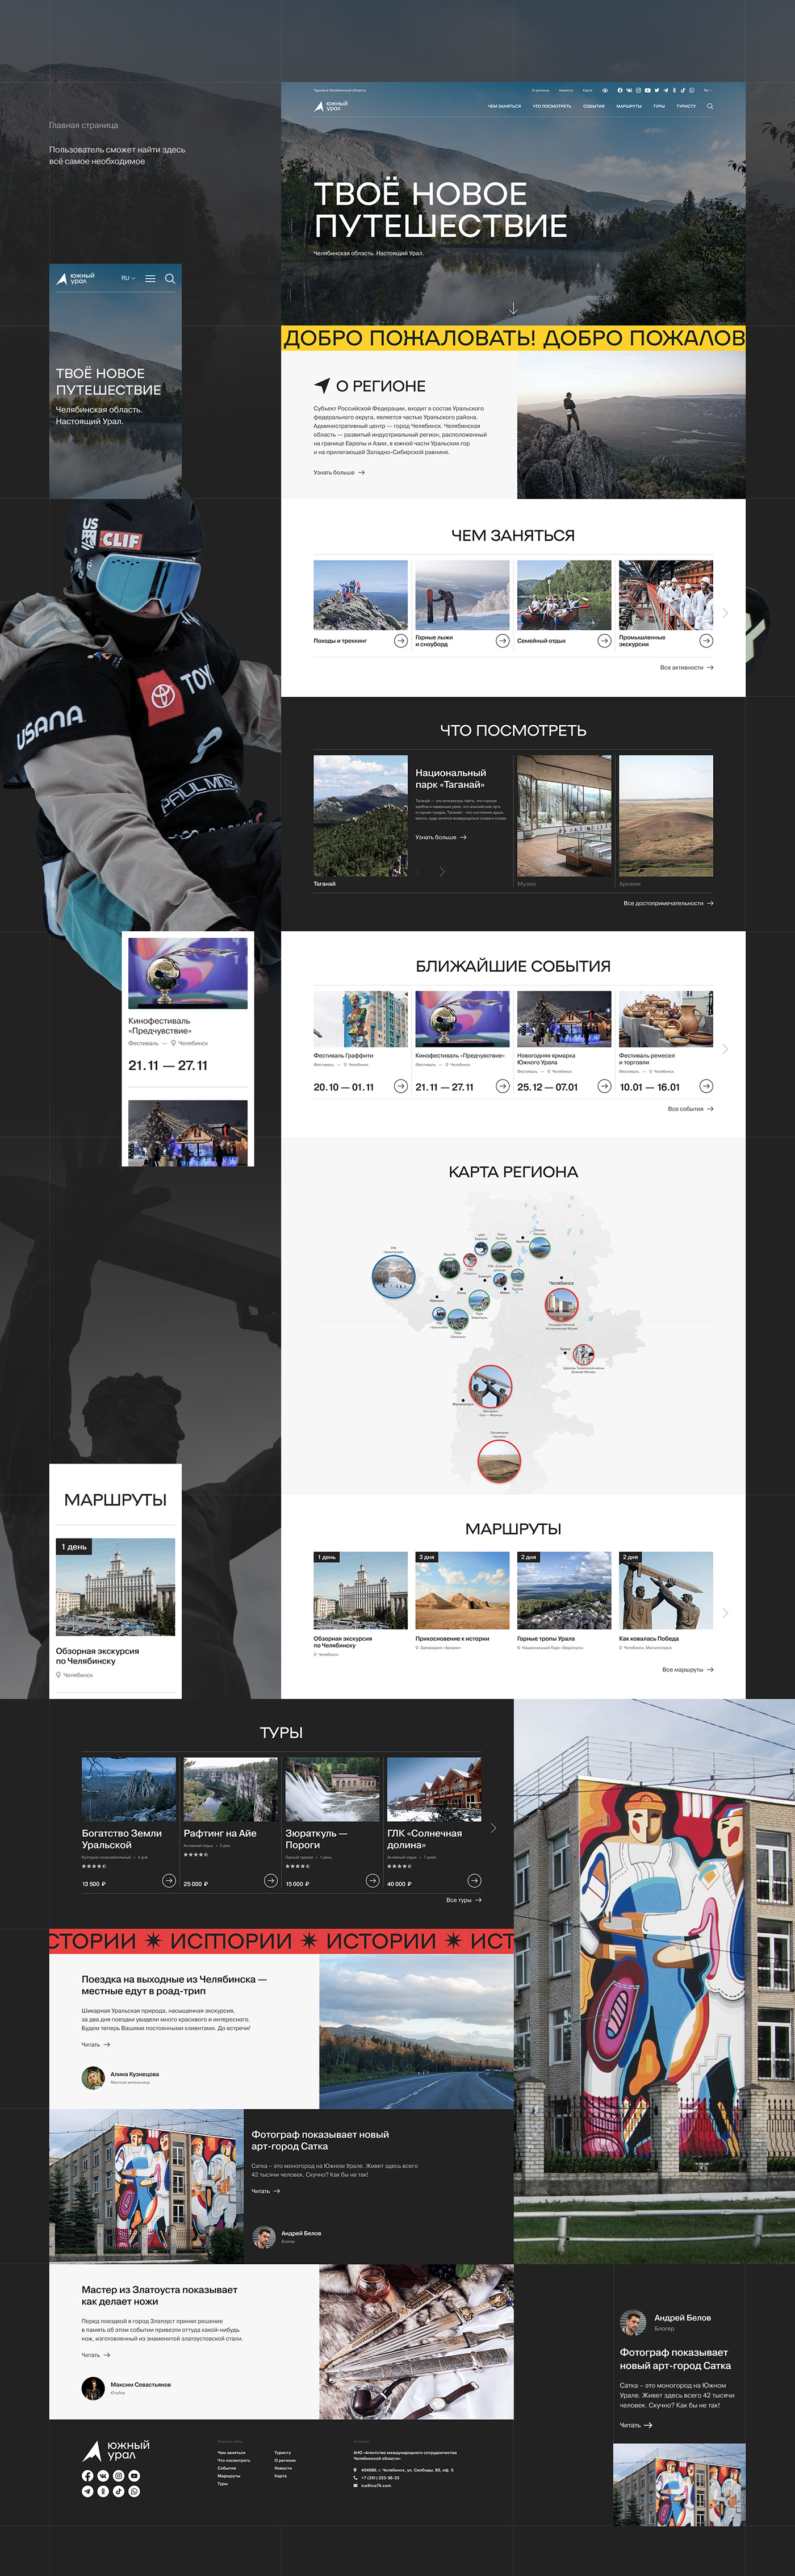 tourism tours Travel Travel Website UI UI/UX ural ux Web Design  Website